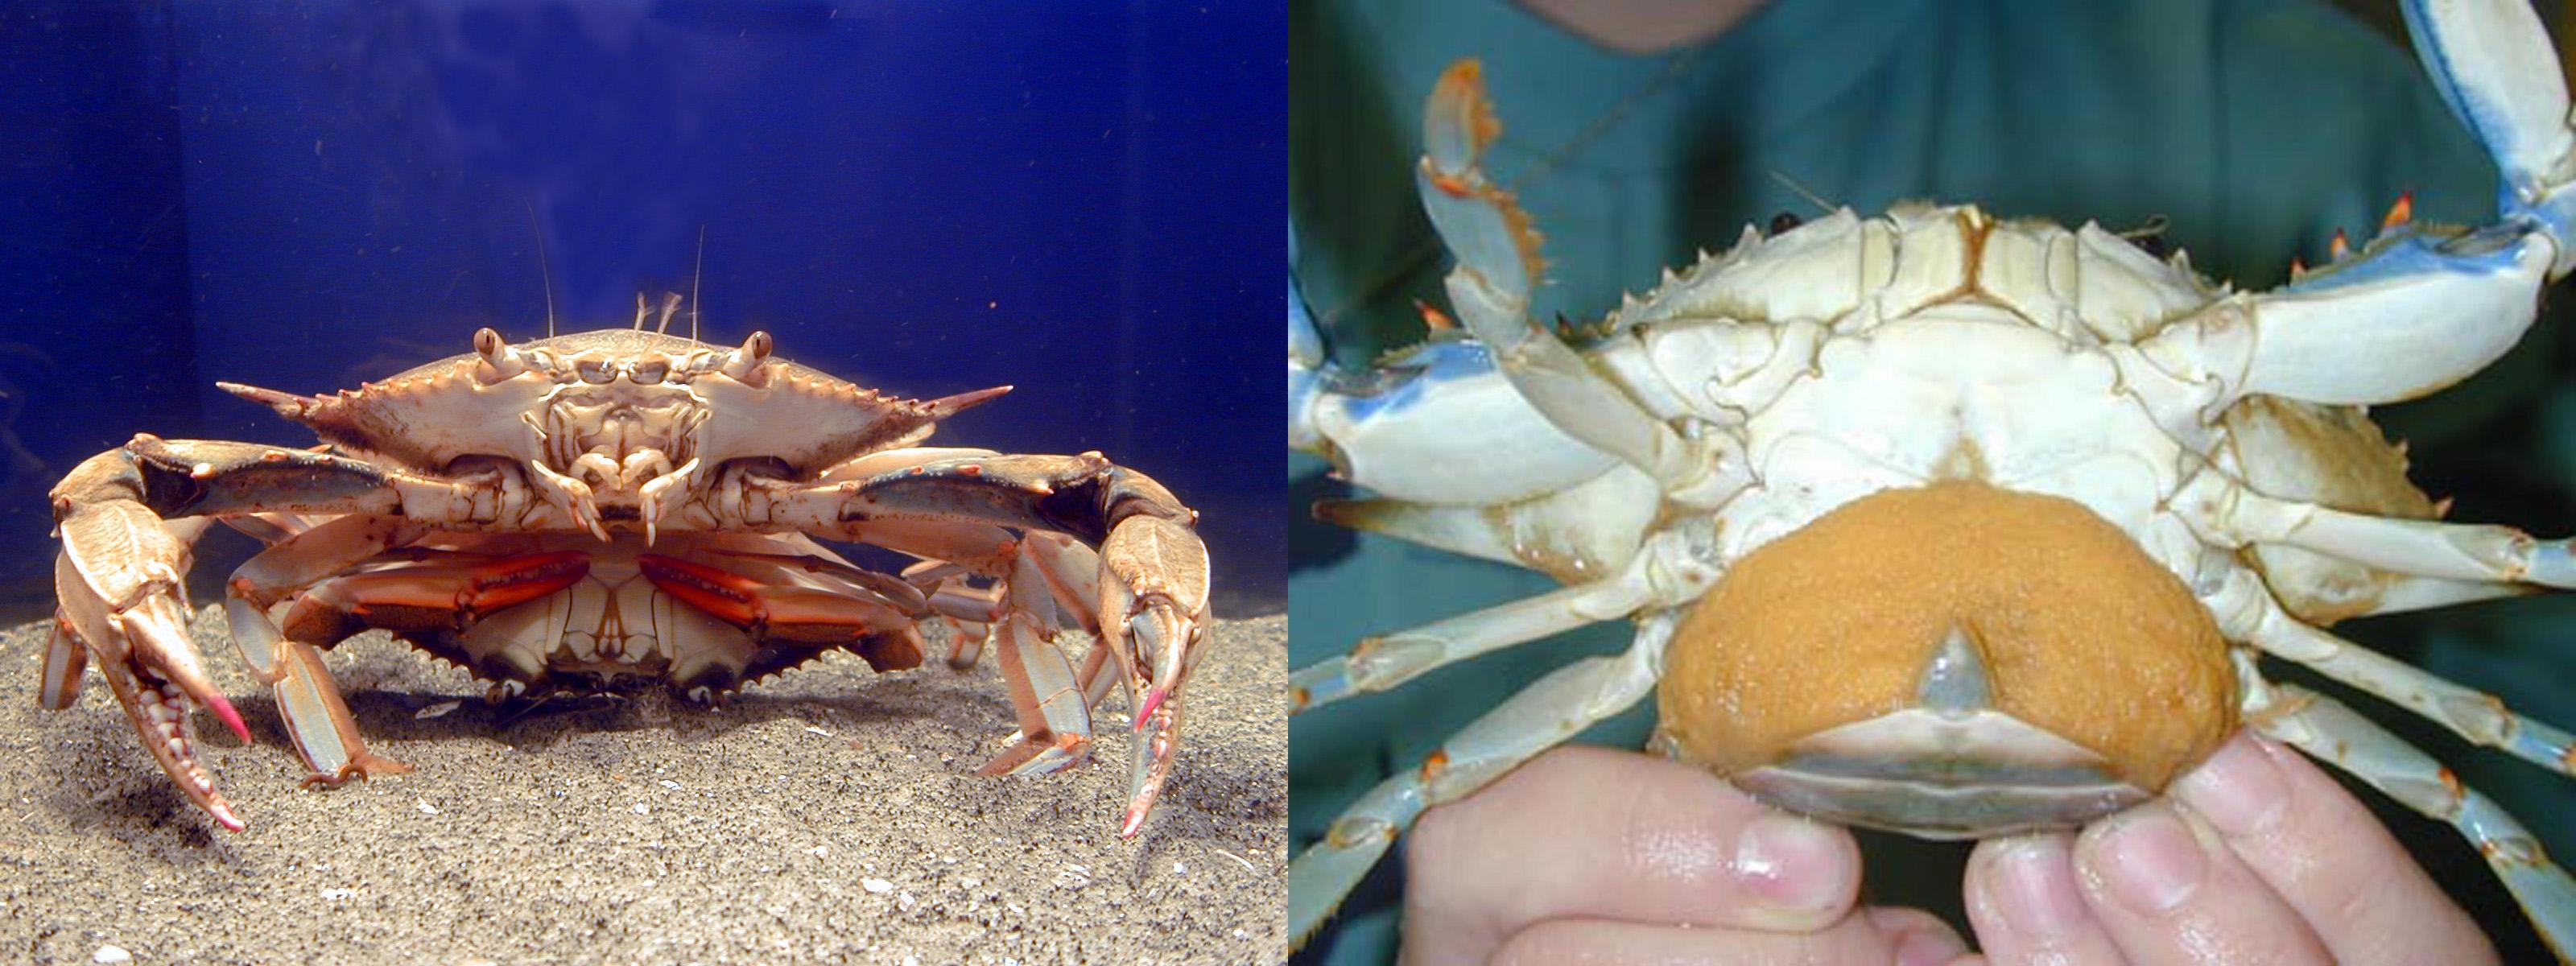 Blue crab sperm picture